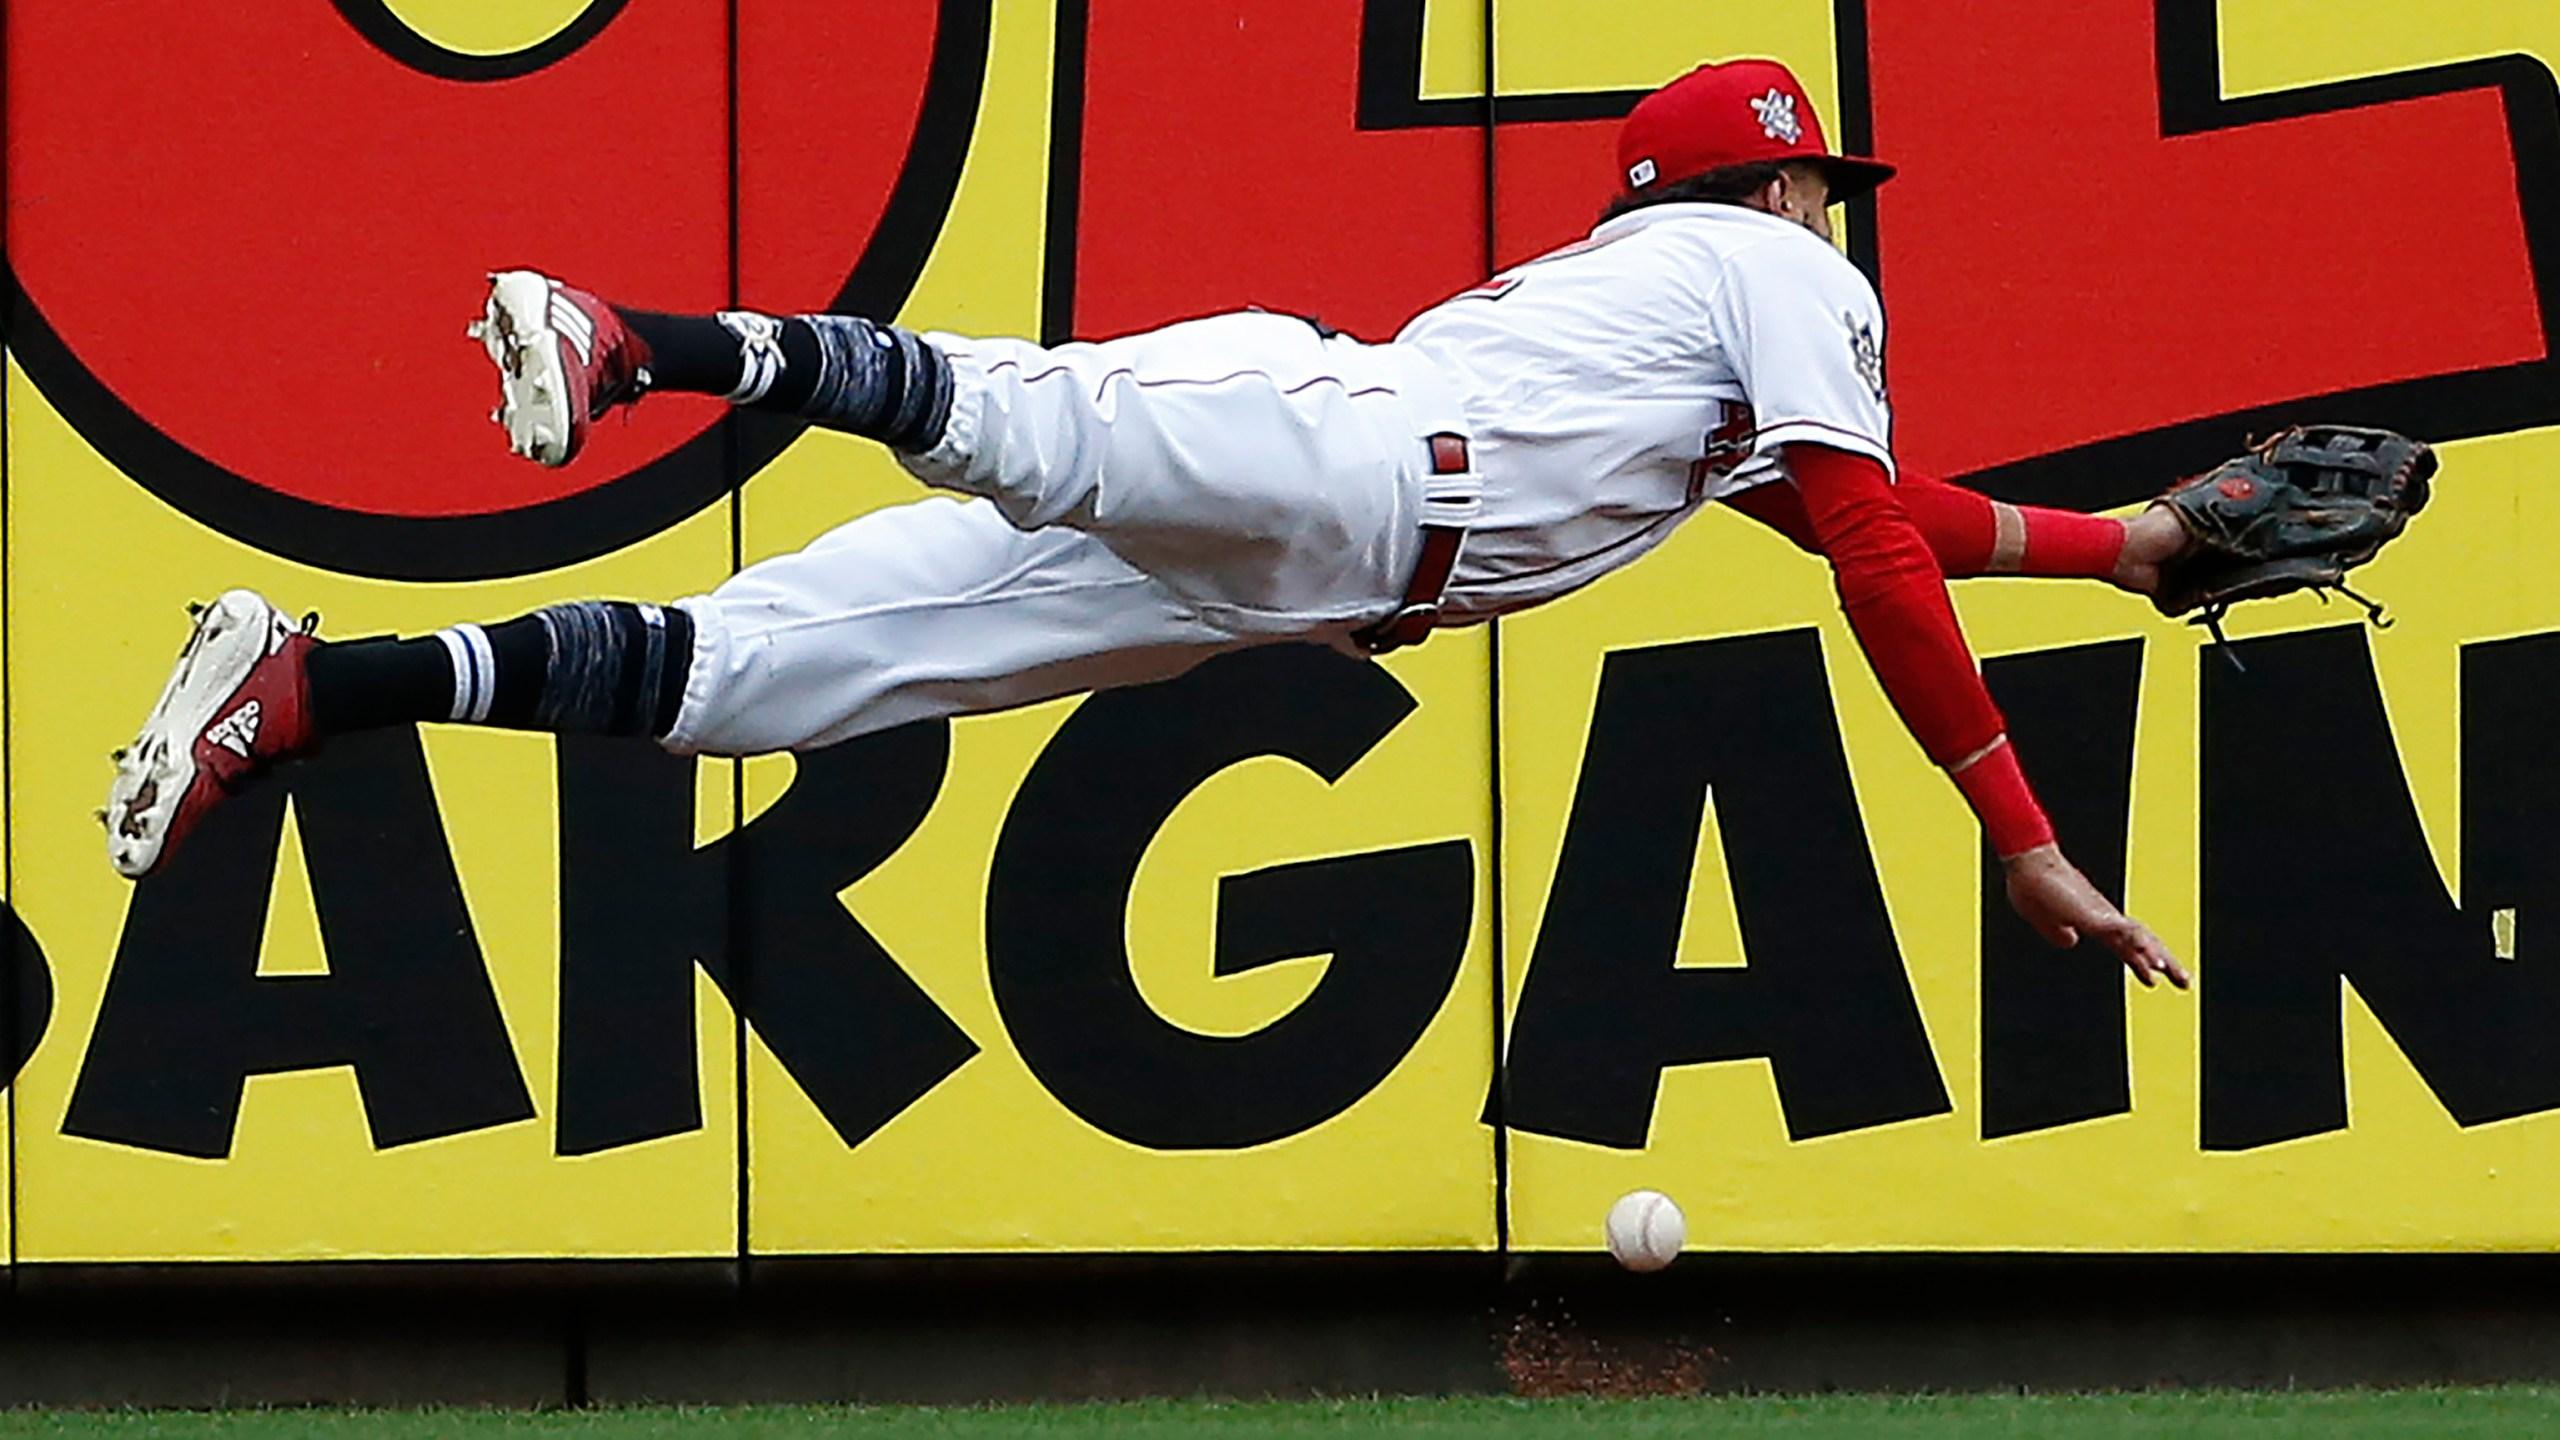 APTOPIX_Cardinals_Reds_Baseball_05498-159532.jpg09768399